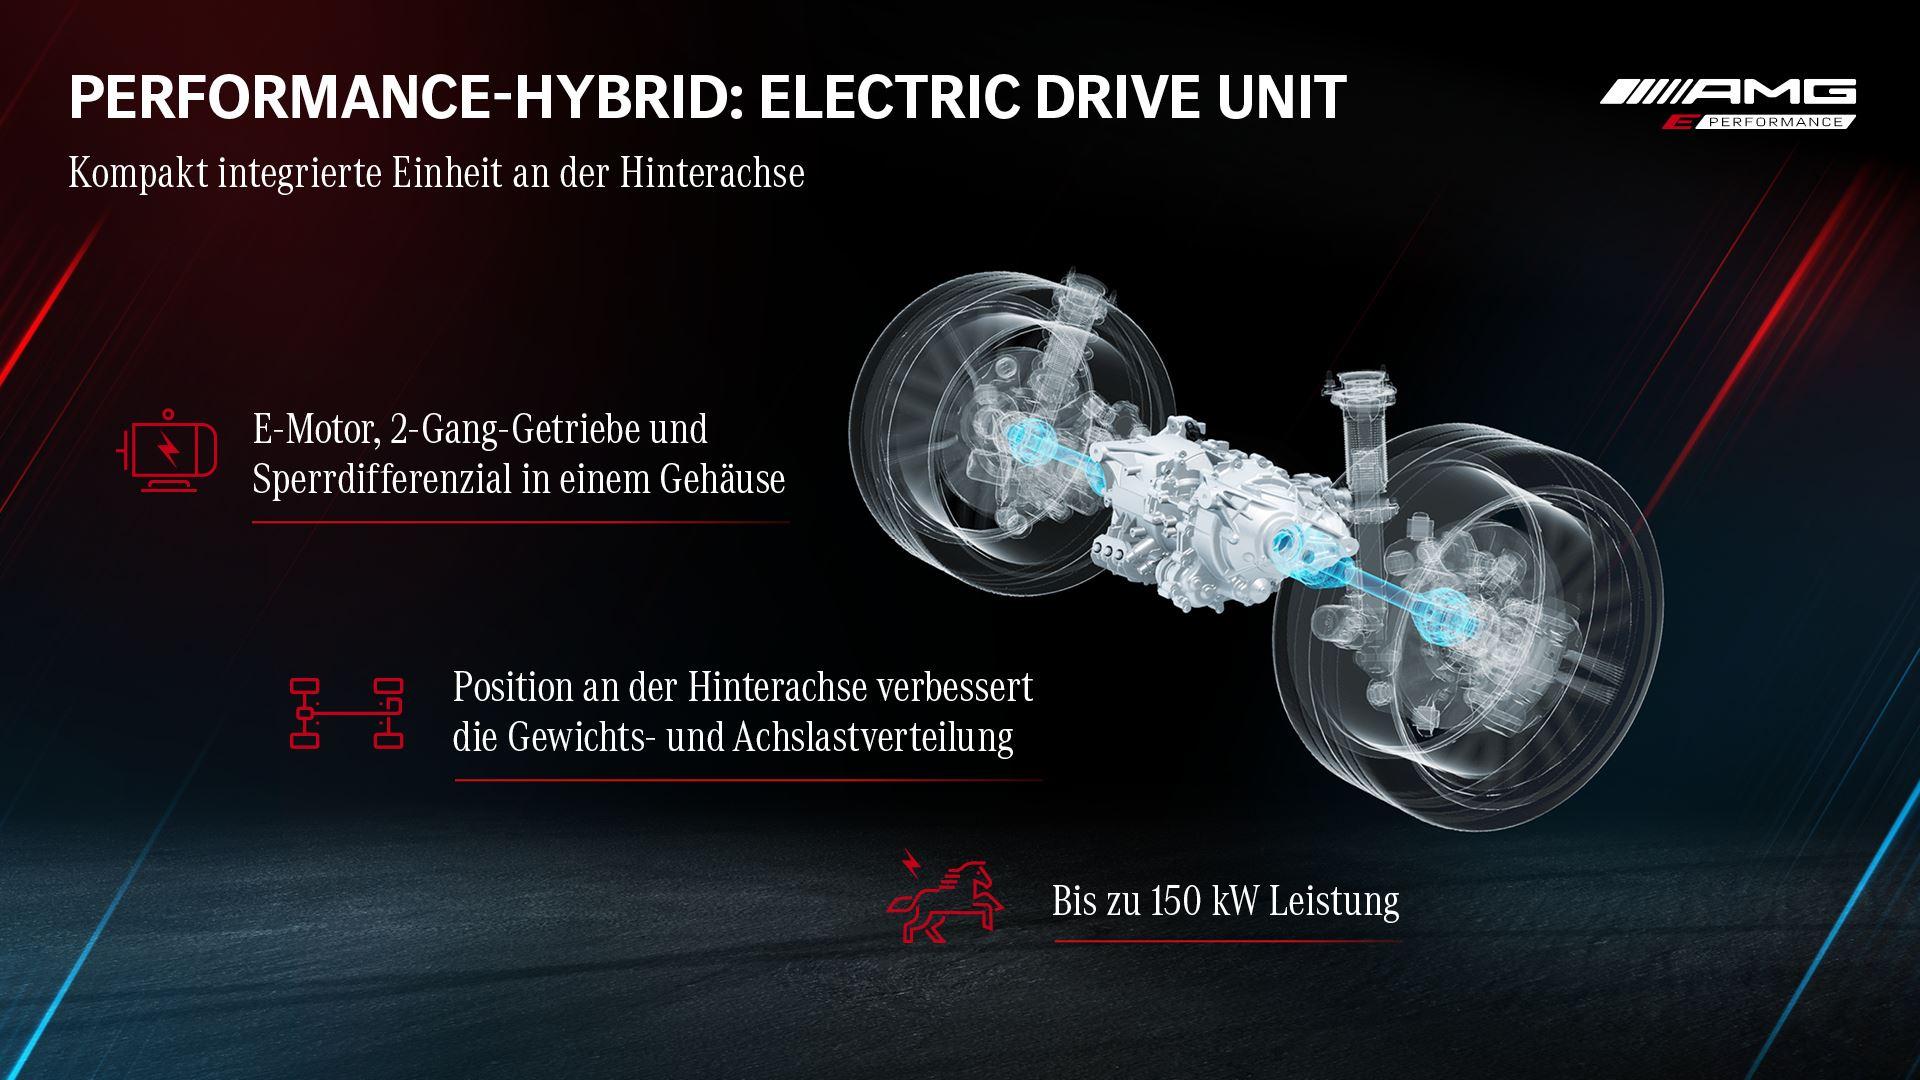 AMG P3 Hybrid